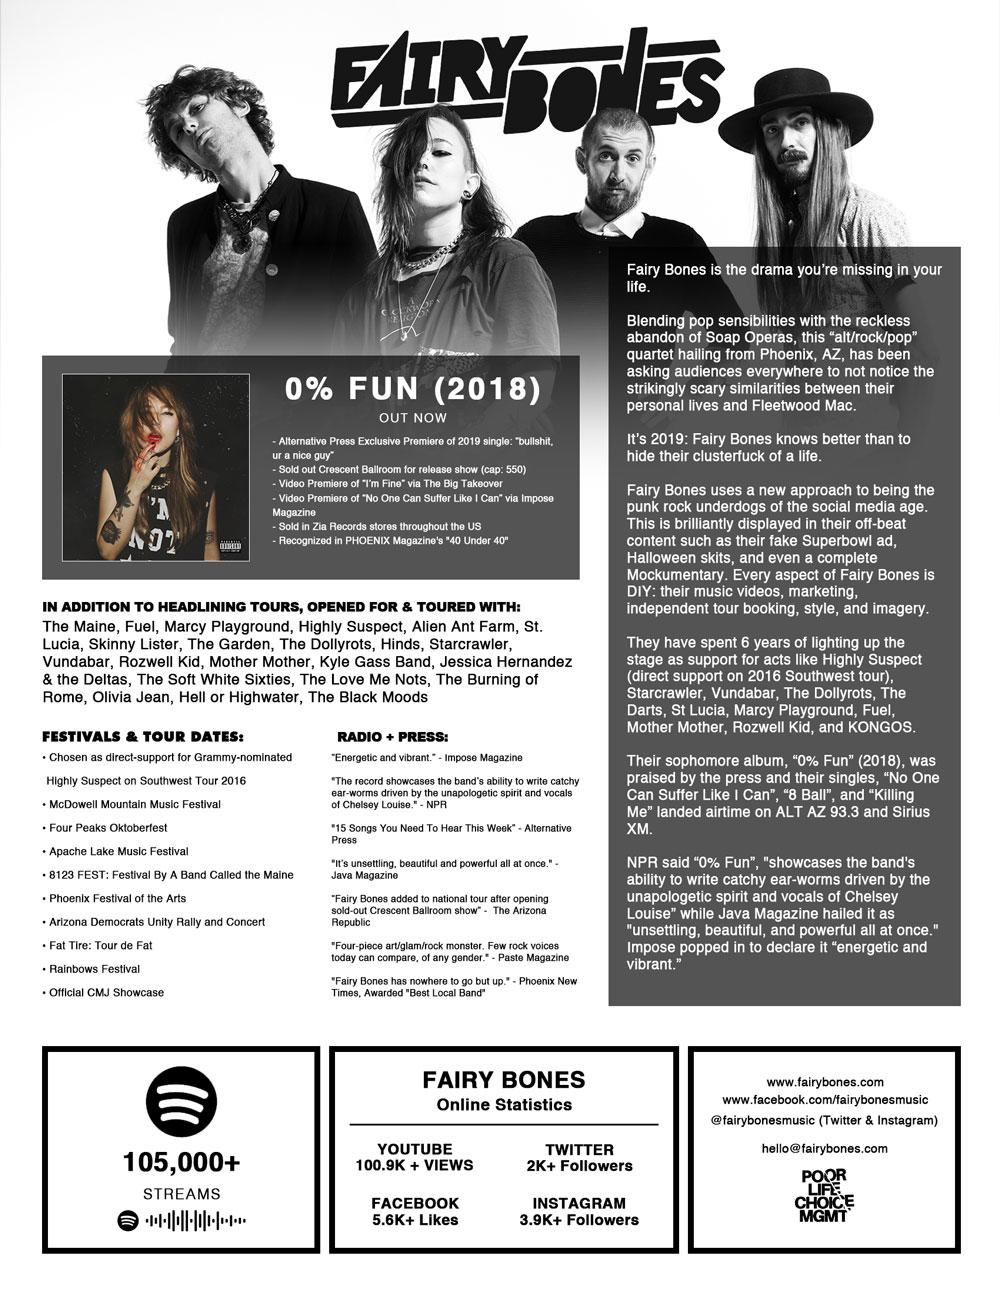 Fairy Bones - Band One Sheet 2019